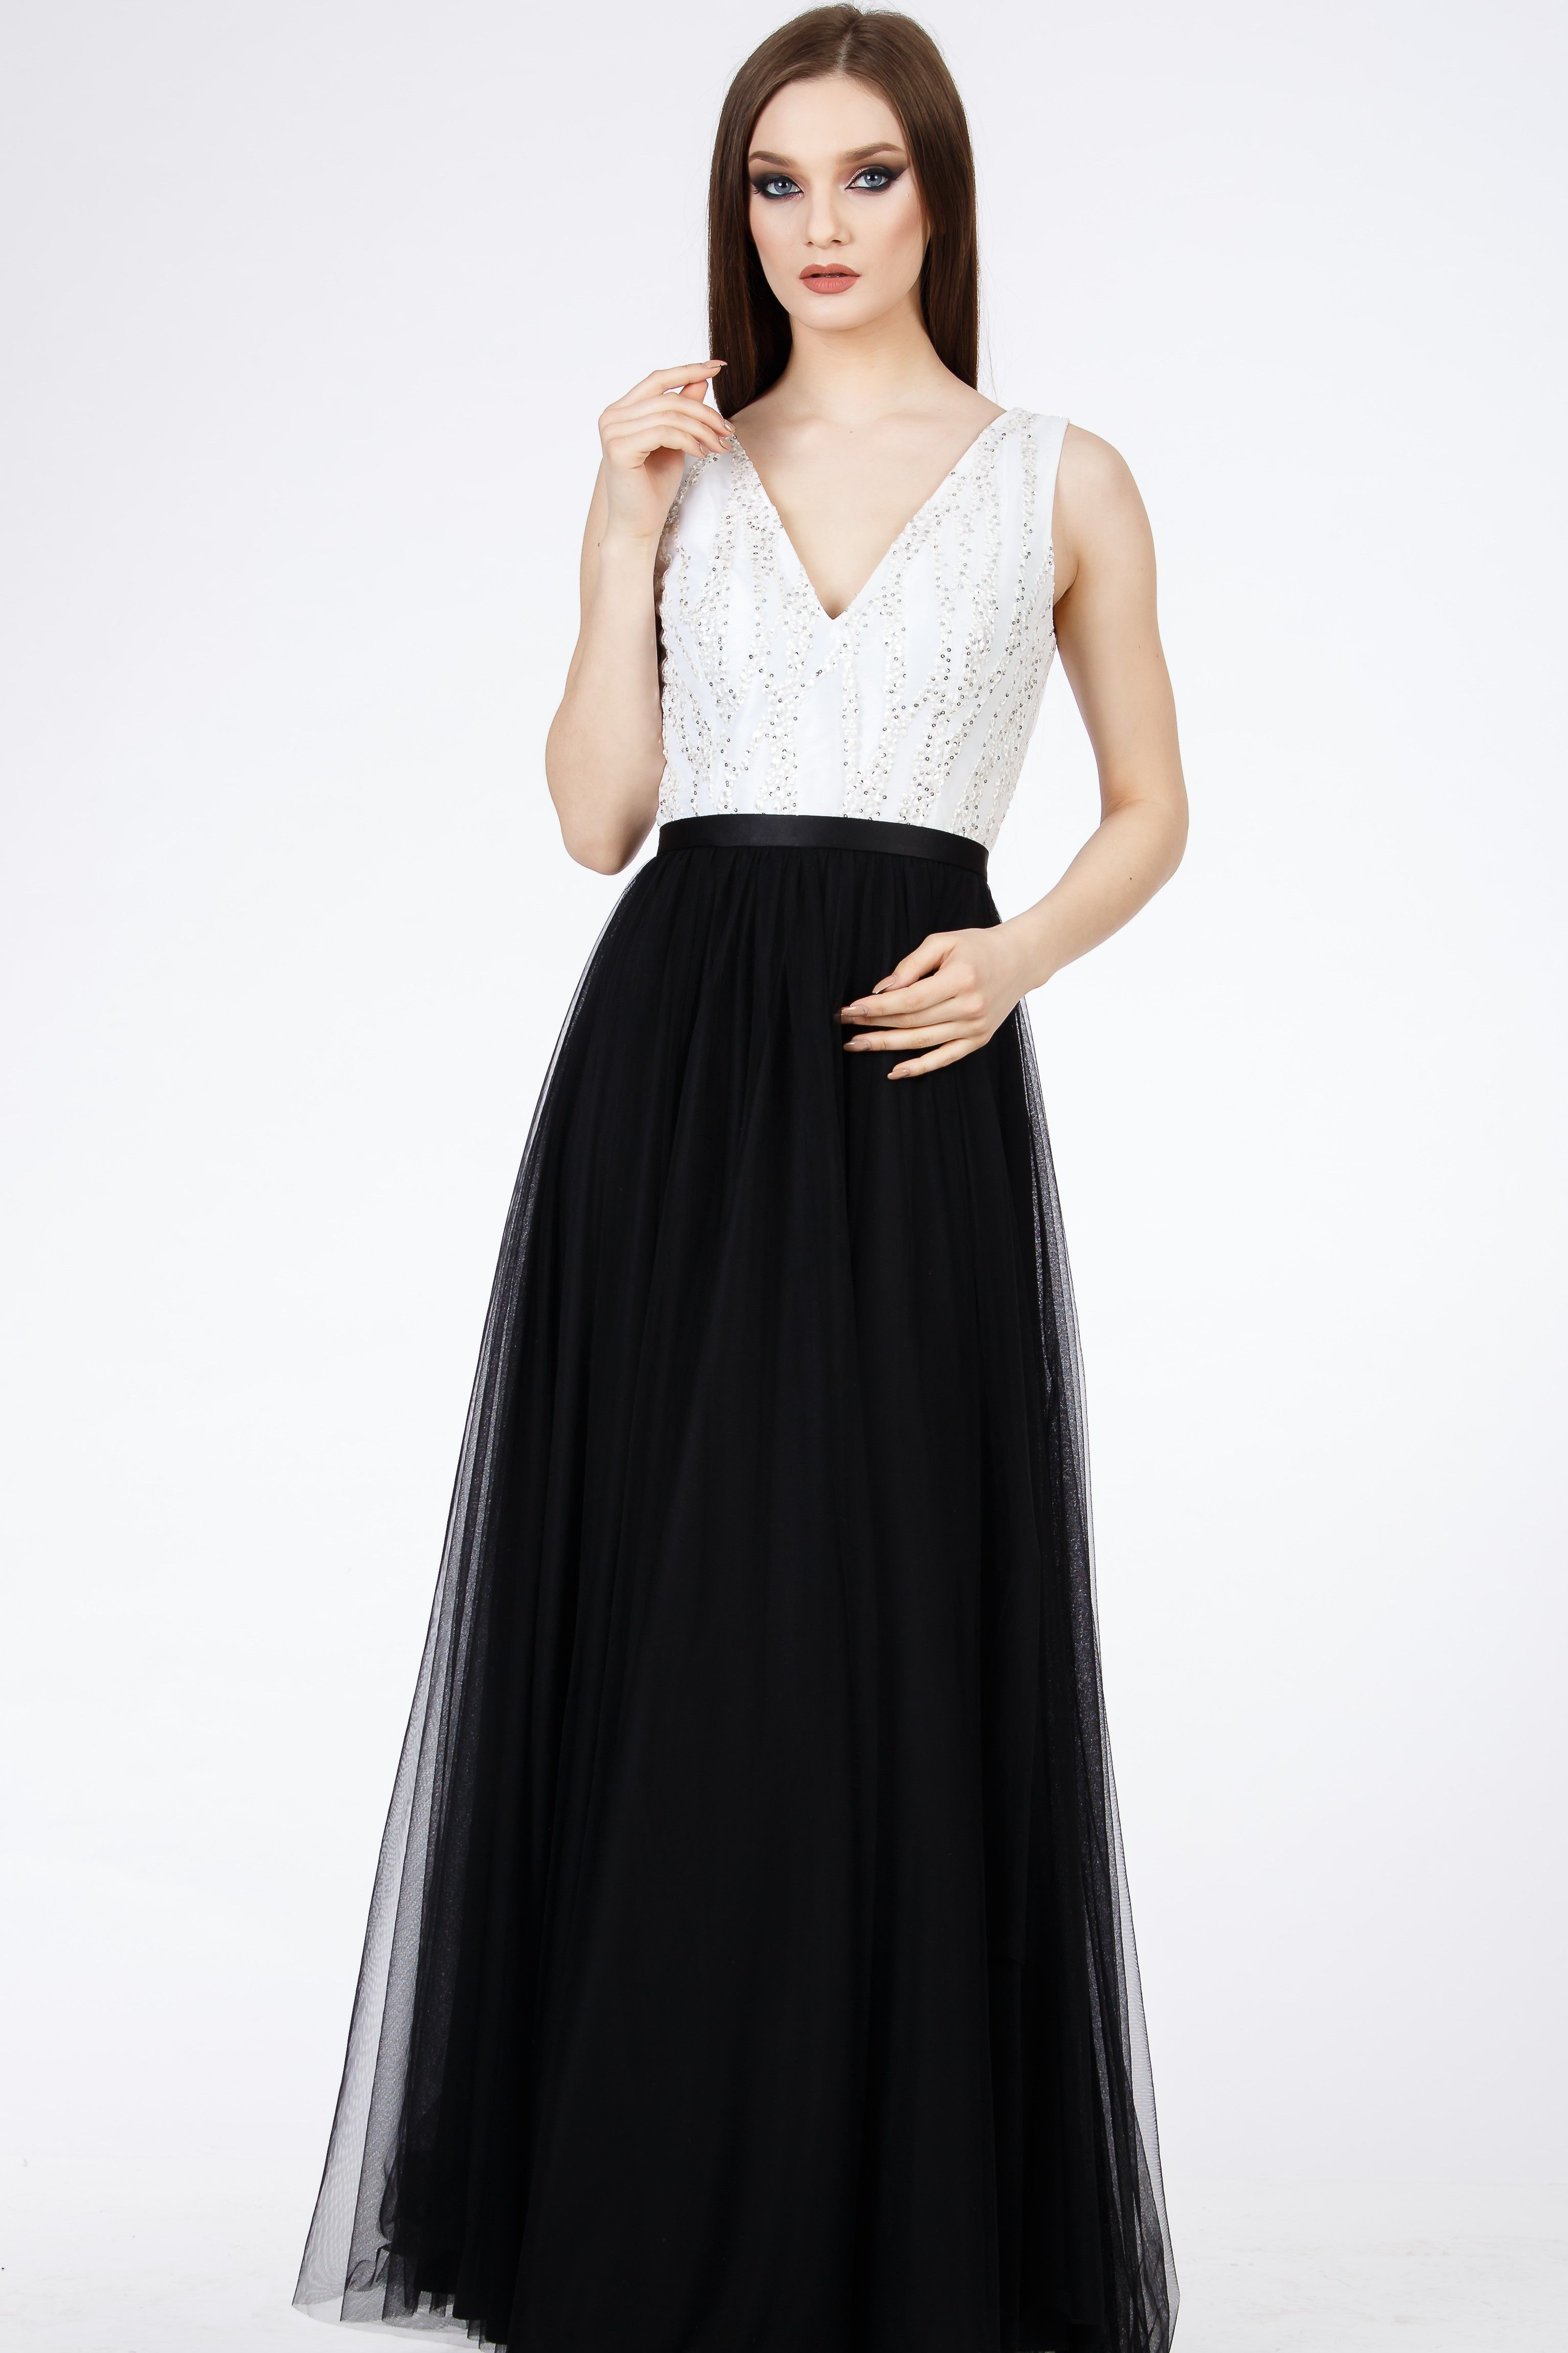 Tulle Dress Princess Dress Black And White Dress Elegant Dress